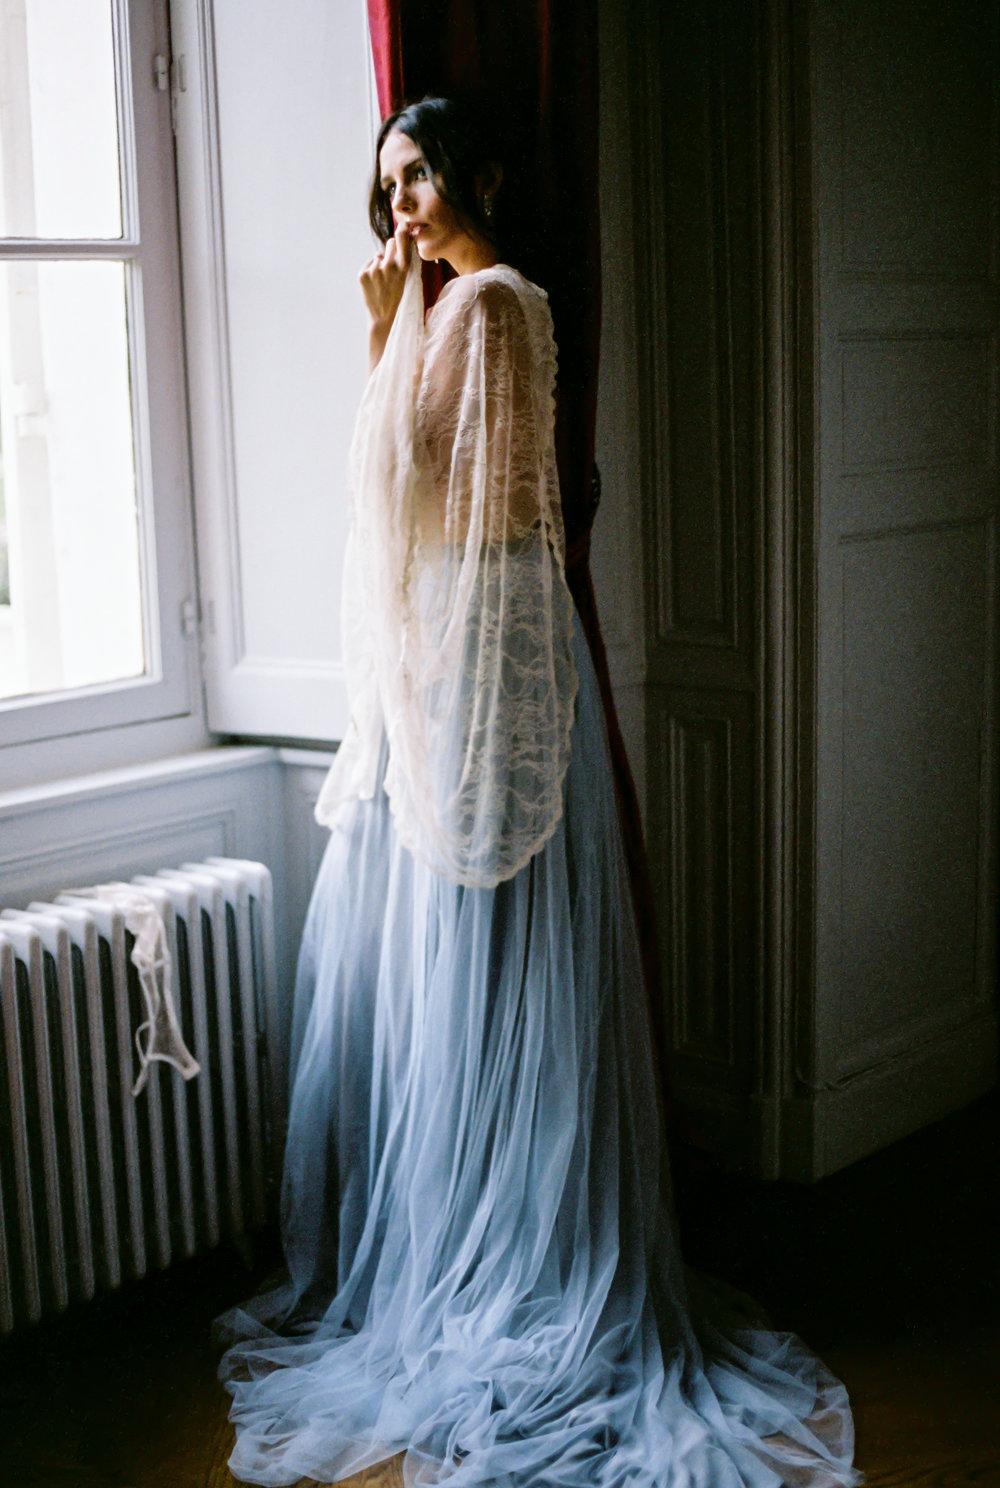 JacquelineAnnePhotography-IndoorParisShoot10.jpg